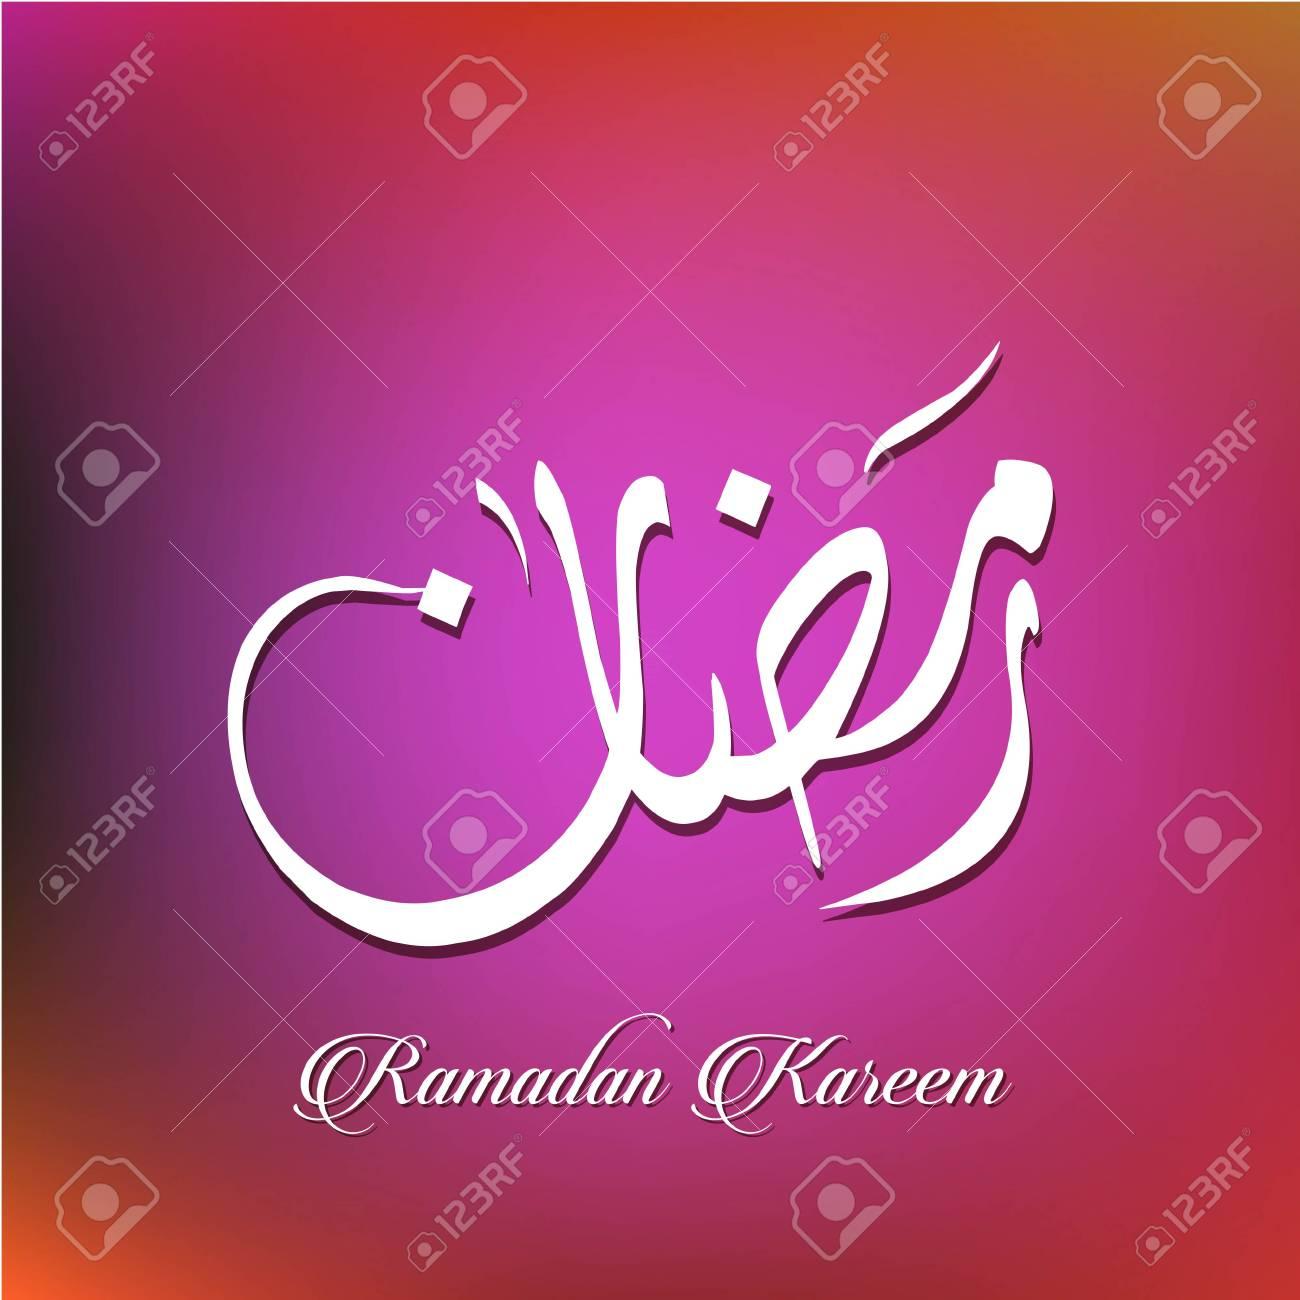 Ramadhan Kareem vectors variations (translation: Generous Ramadhan)